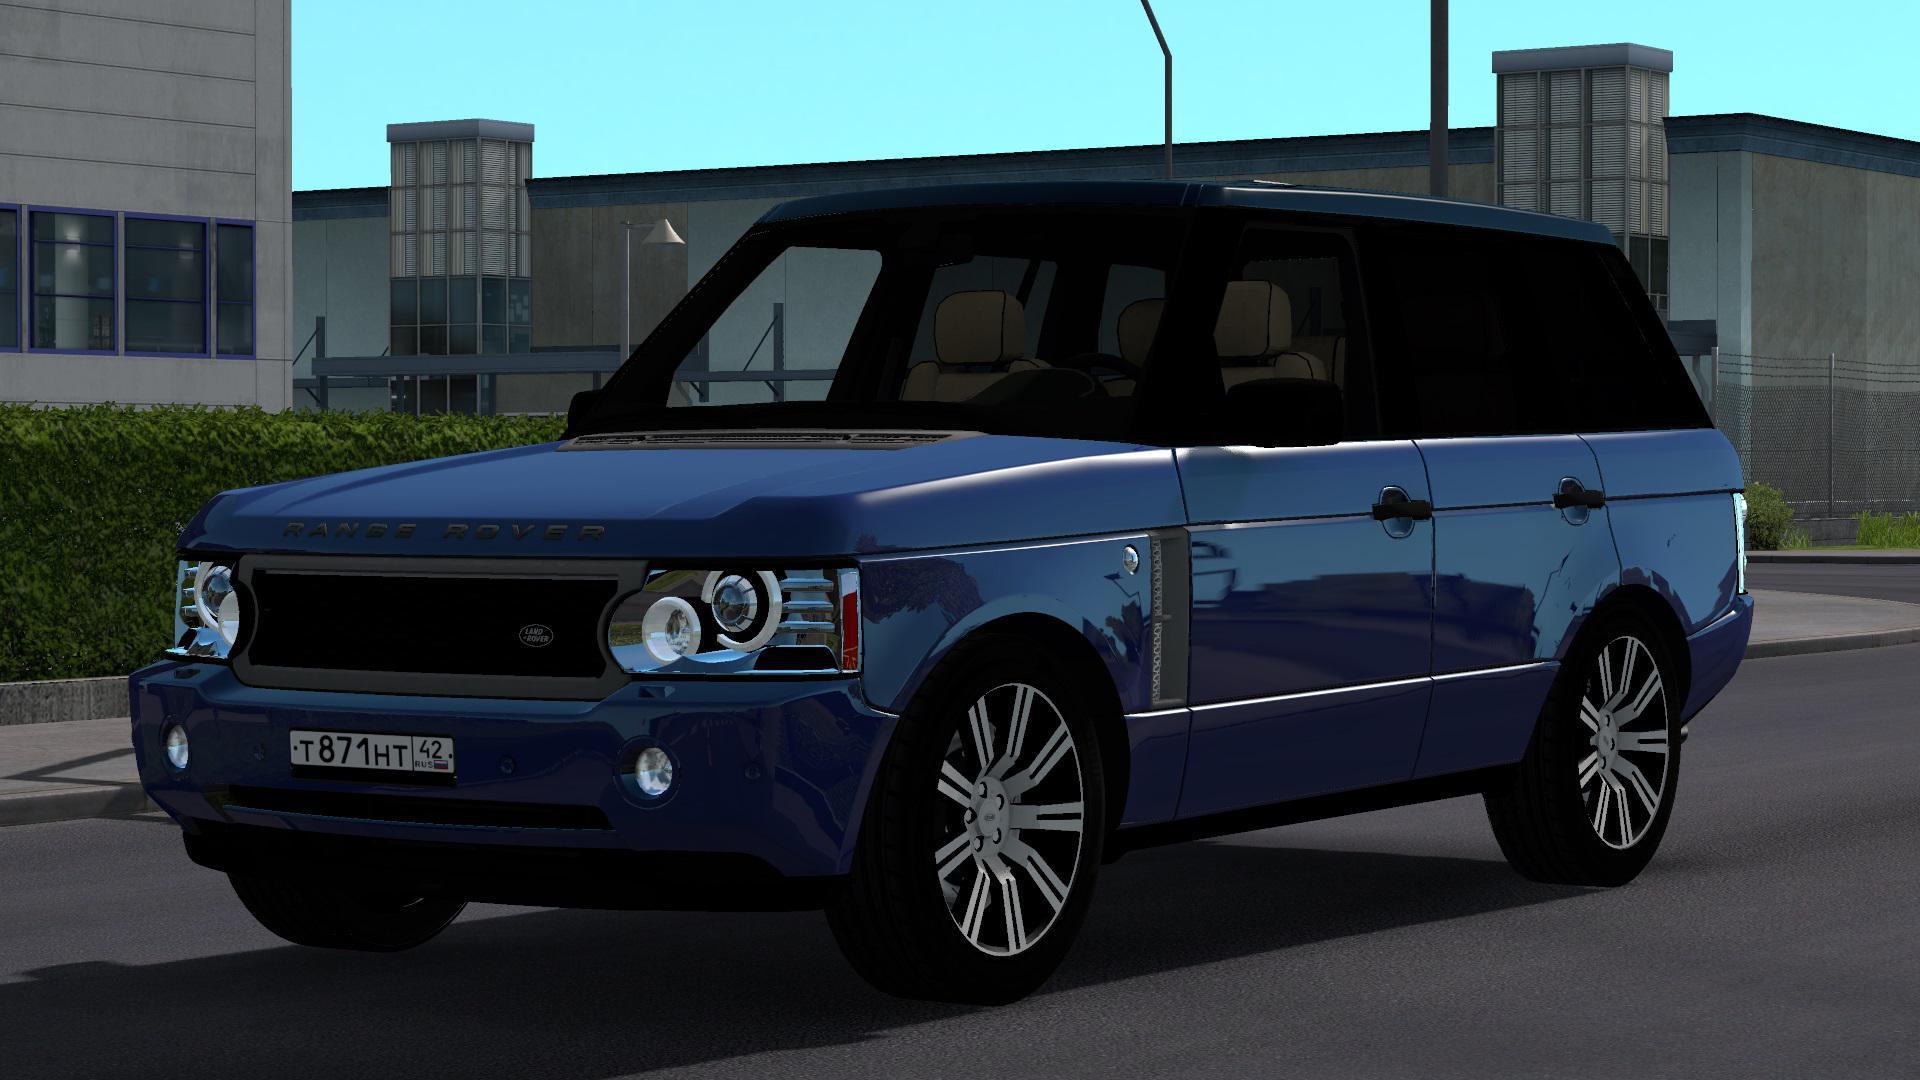 ETS2 - Range Rover Supercharged 2008 V5.0 (1.38.x)